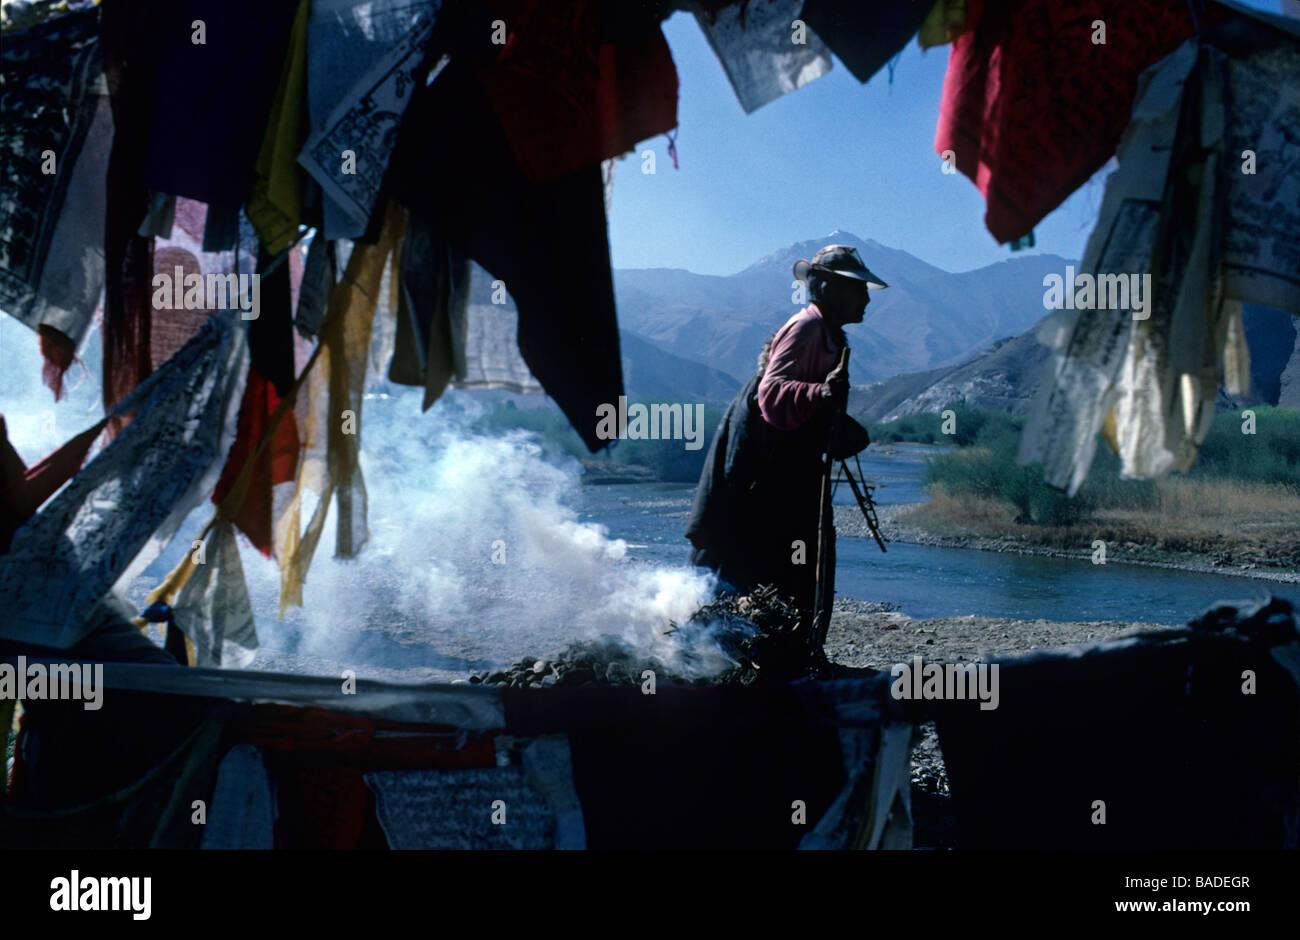 China, Tibet, Lhassa, Tibetan pilgrim - Stock Image